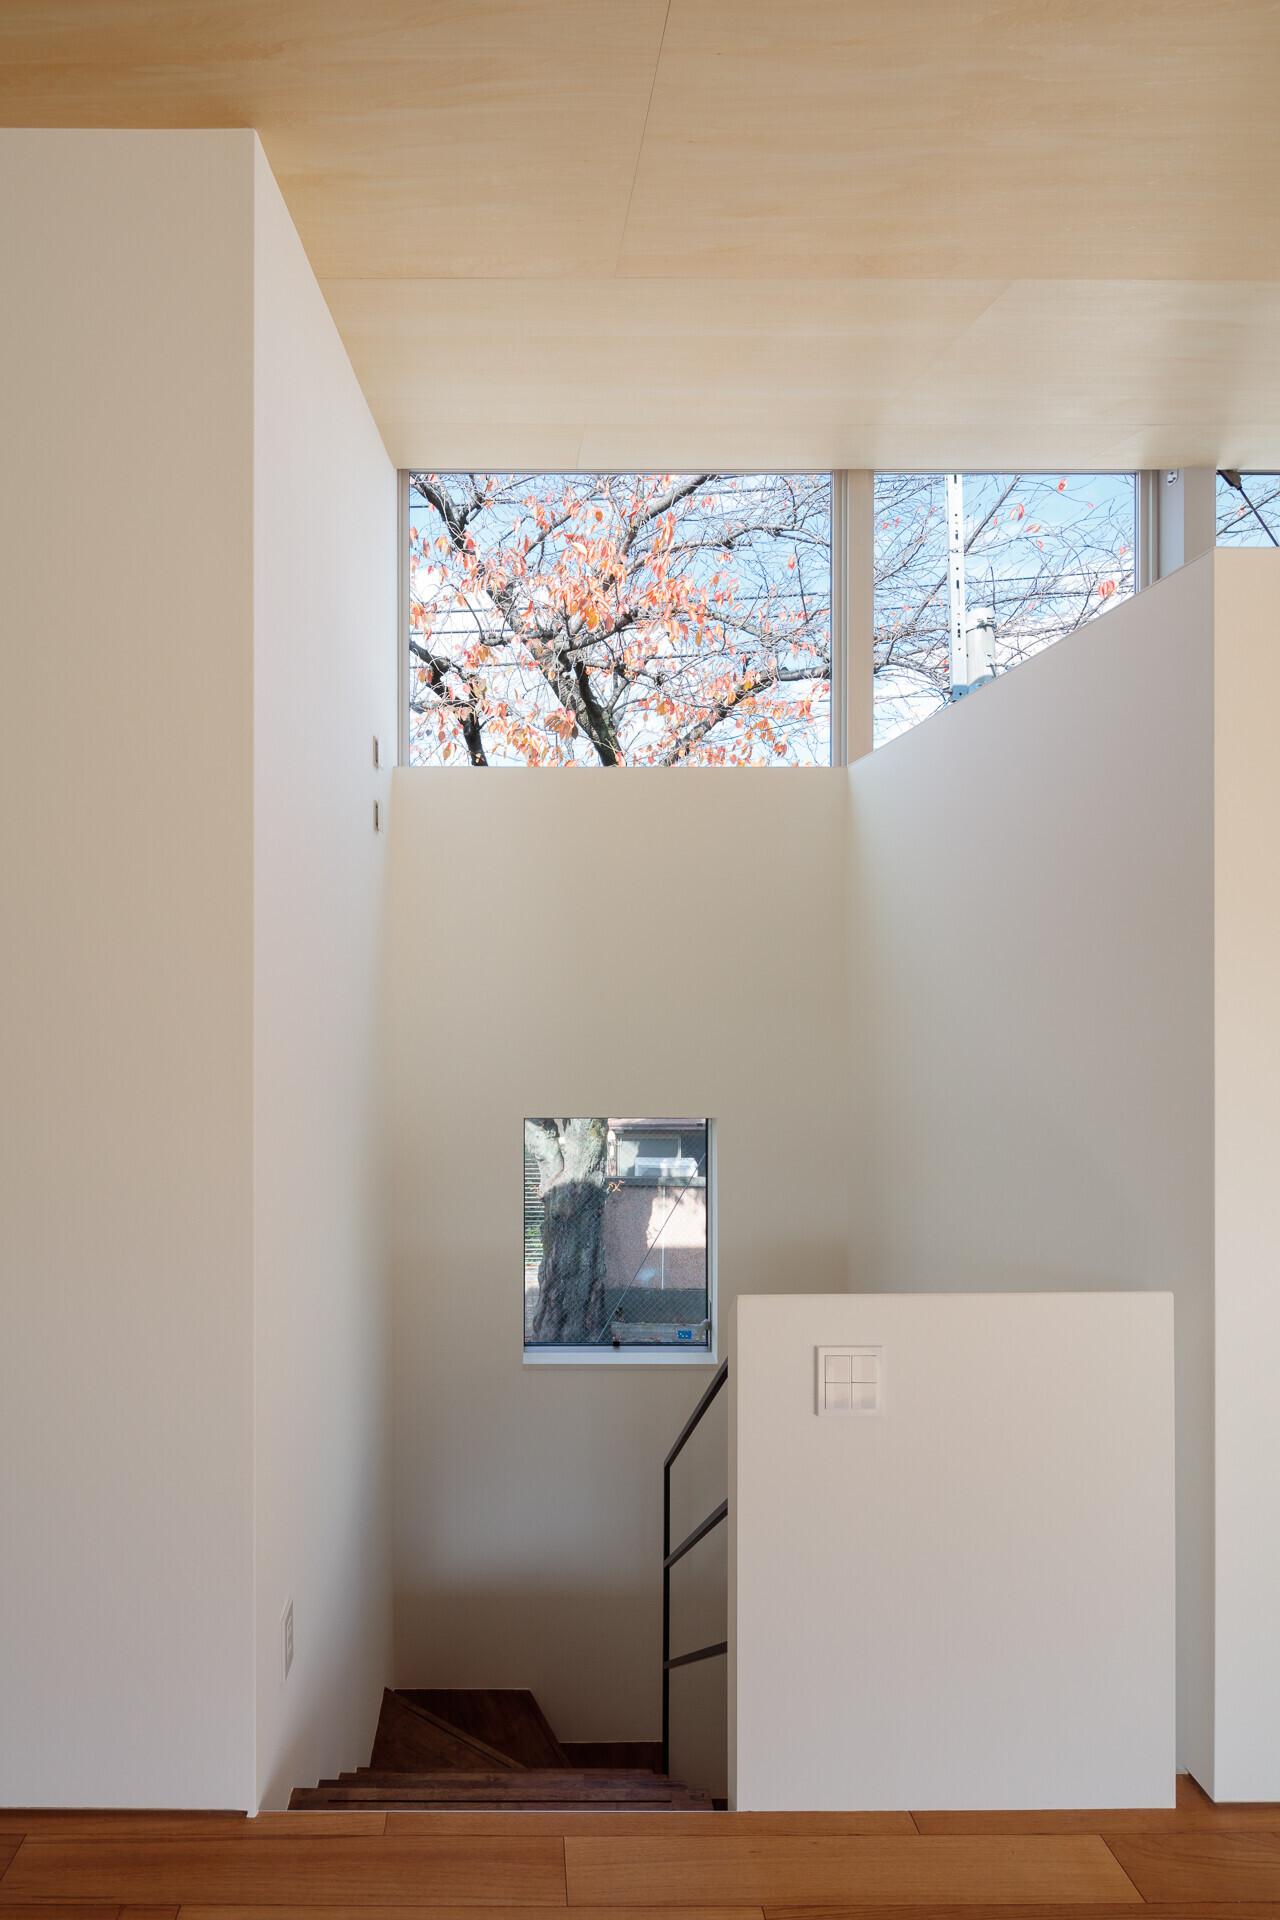 photo by大沢誠一 | 桜並木と暮らす家